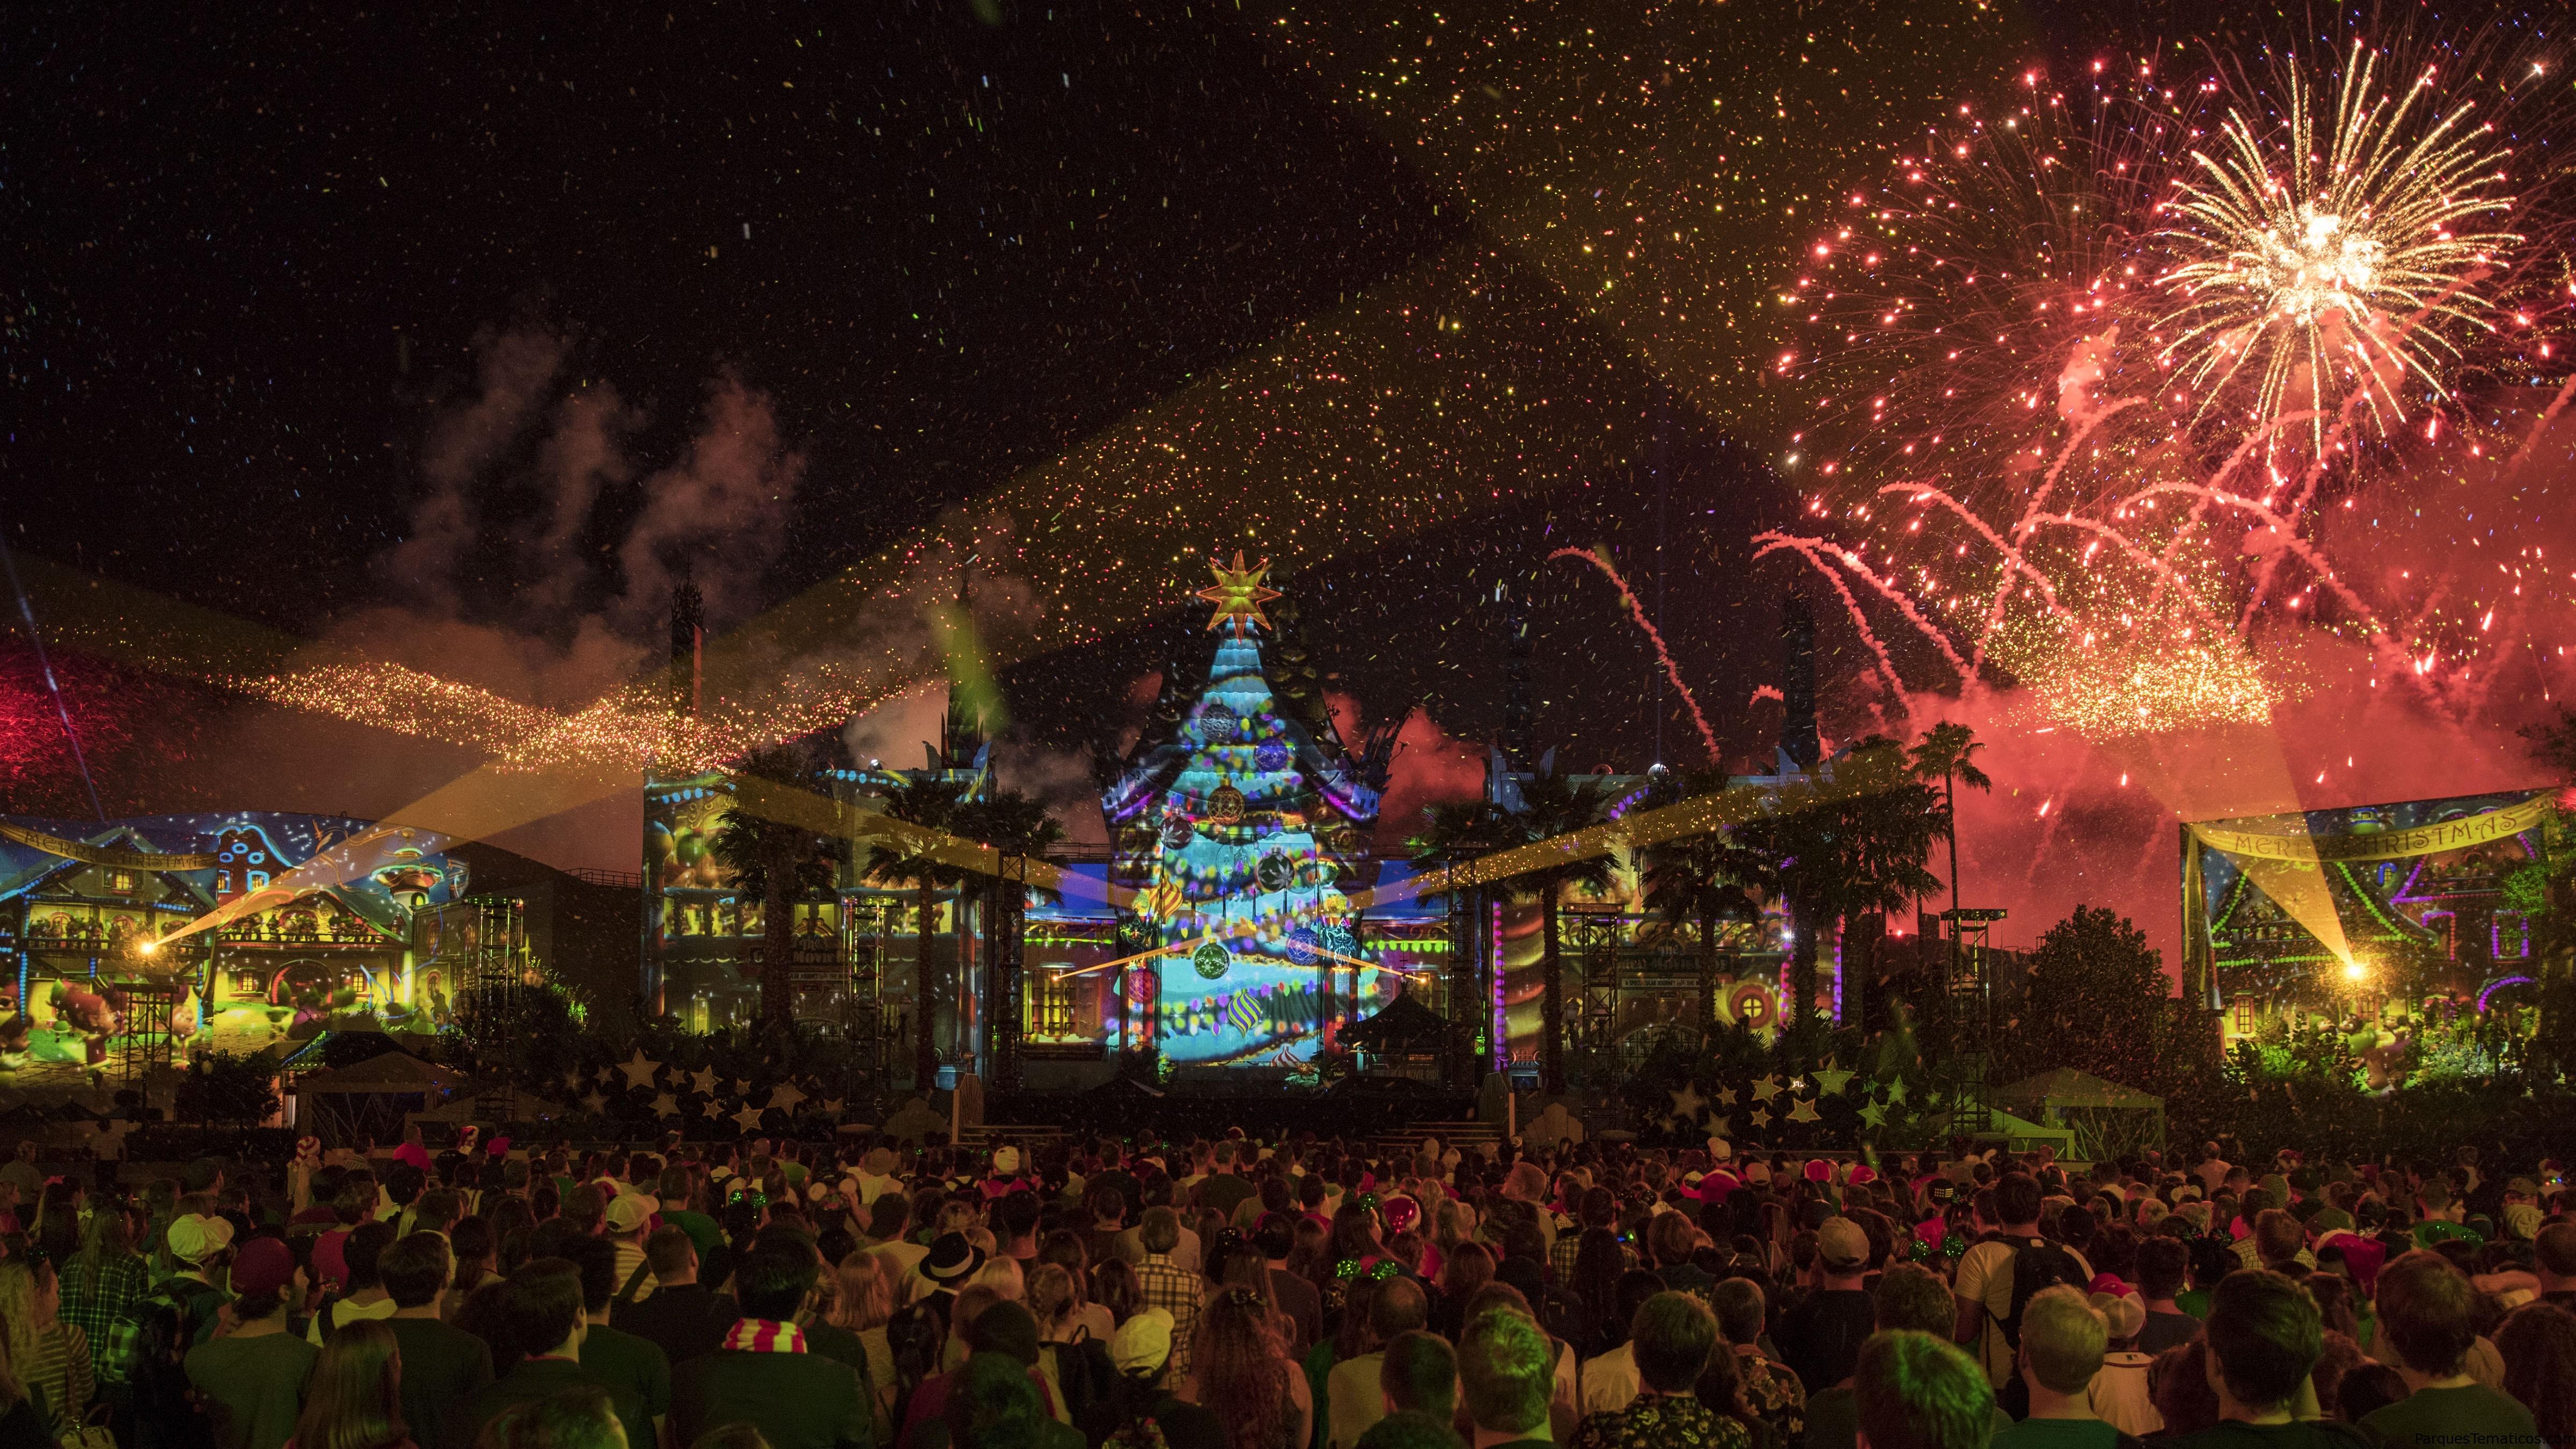 Jingle Bell, Jingle BAM! at Disney's Hollywood Studios